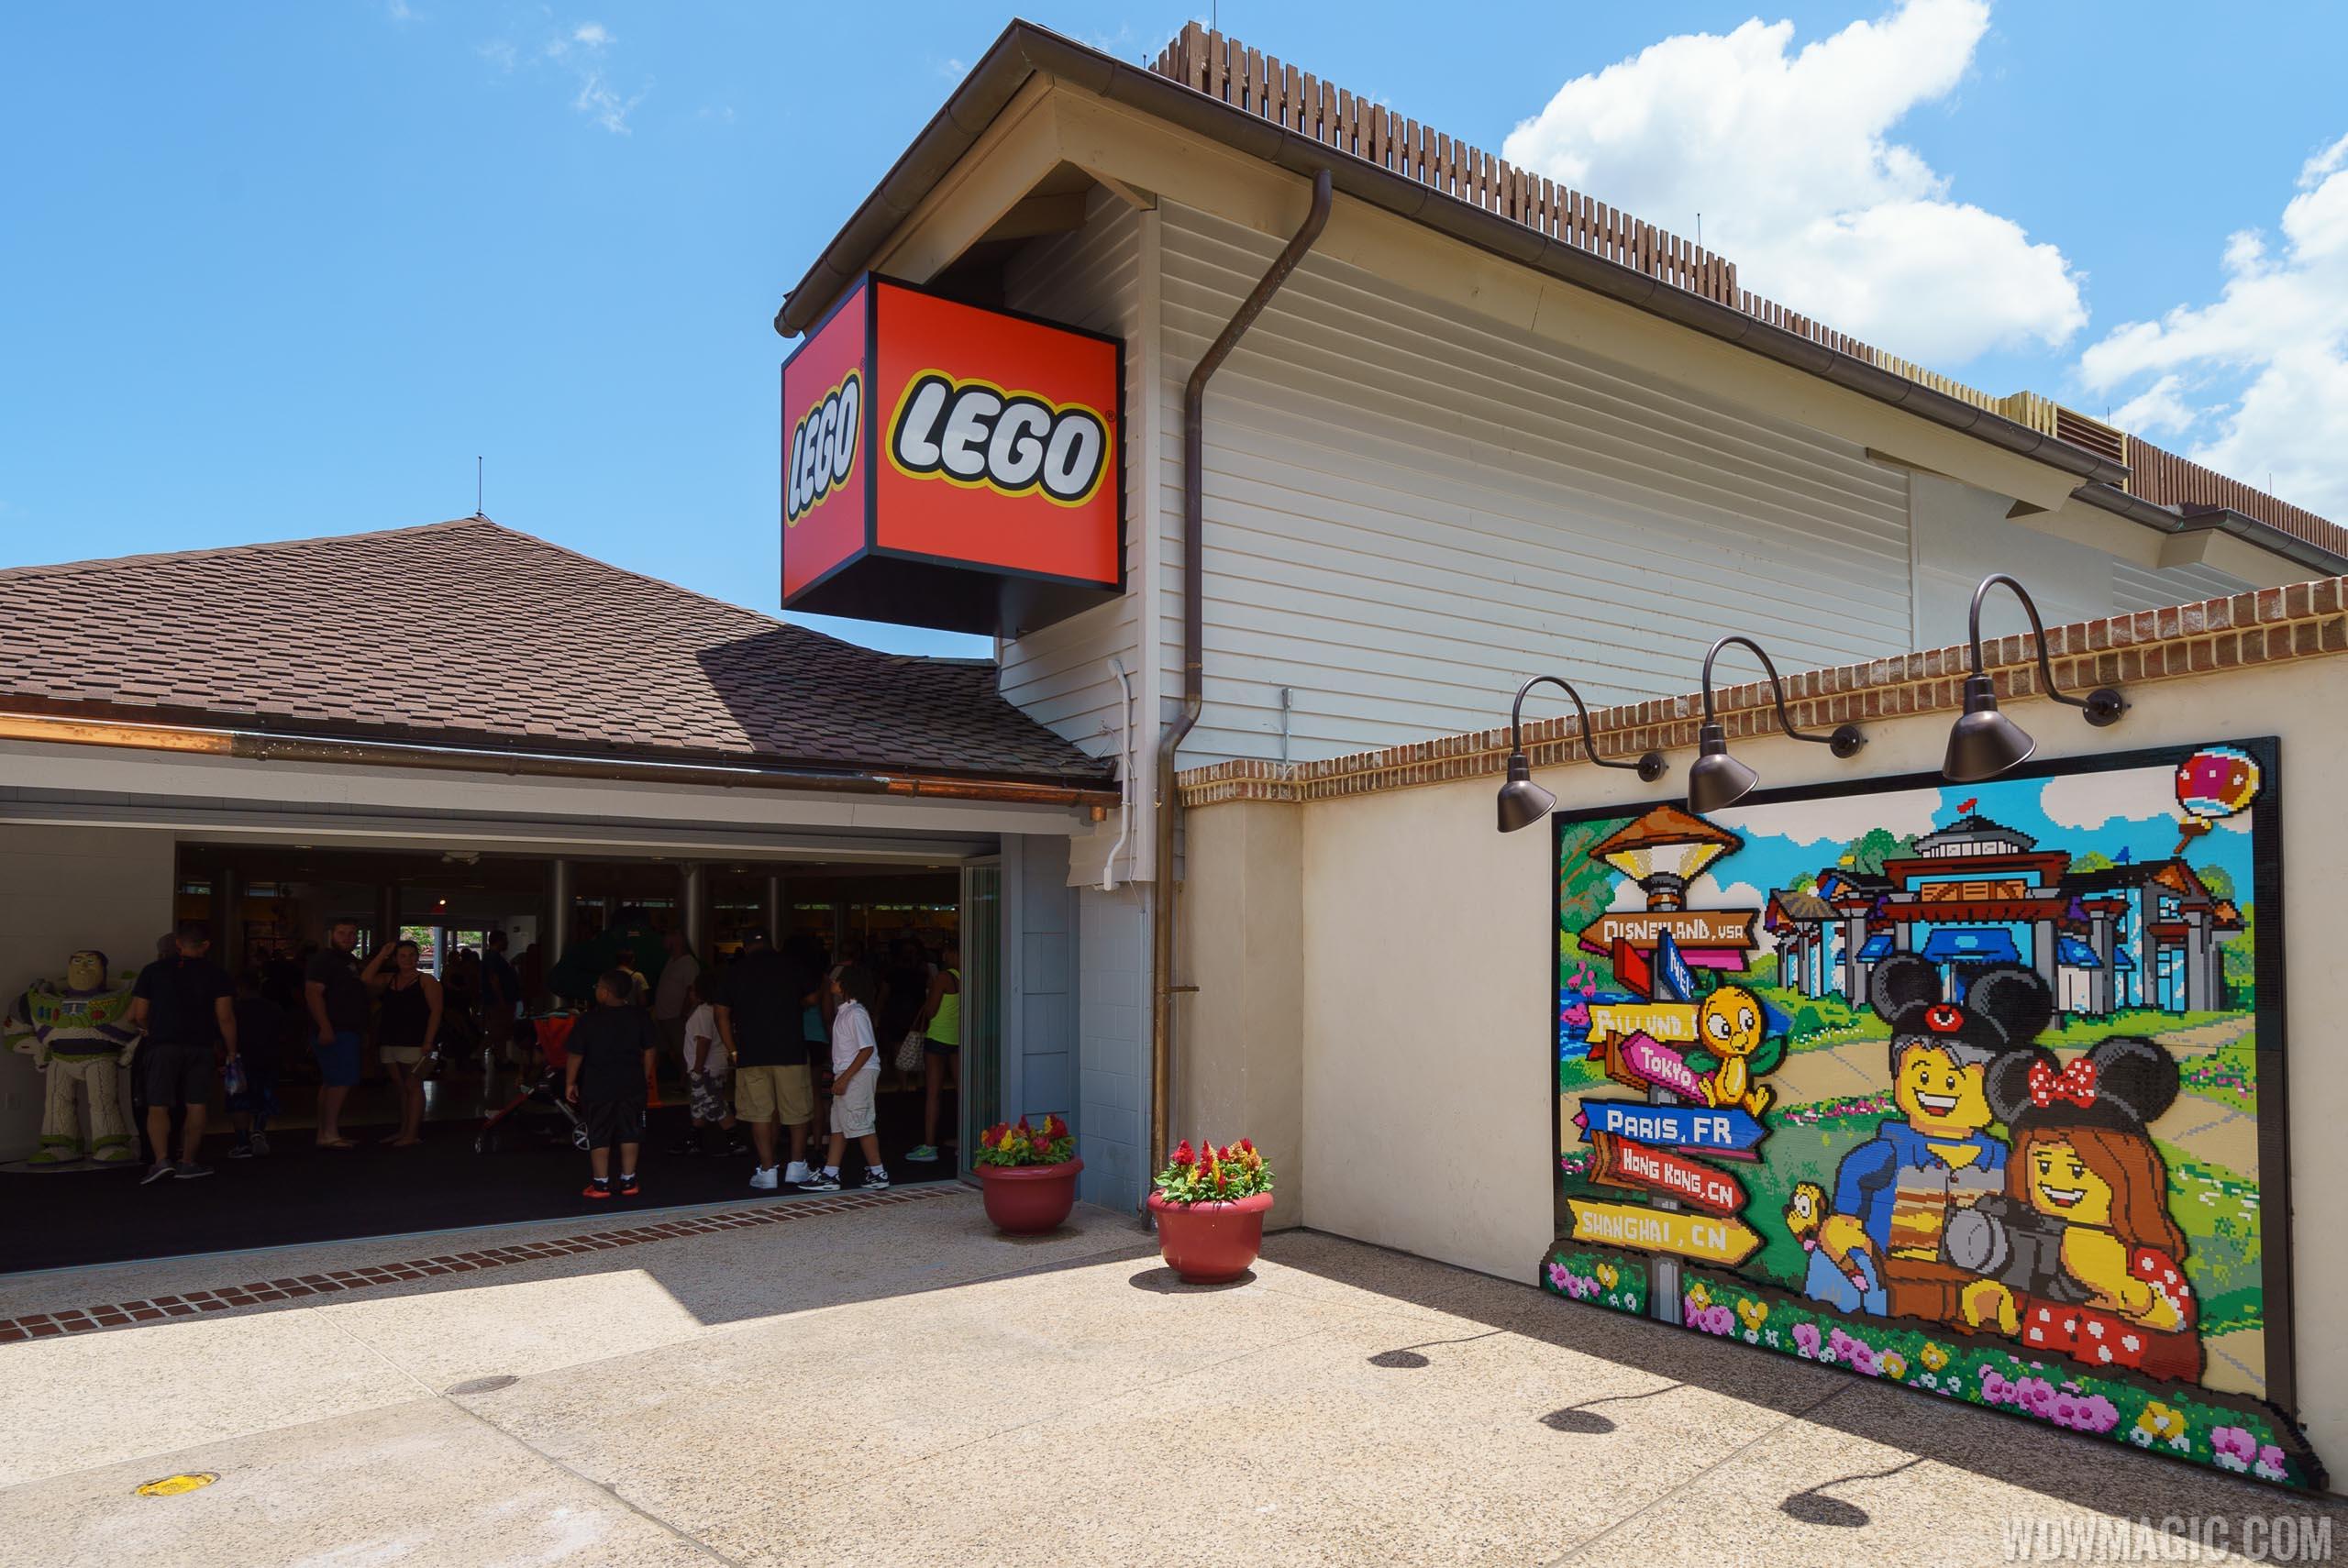 LEGO mural at Disney Springs Town Center entrance